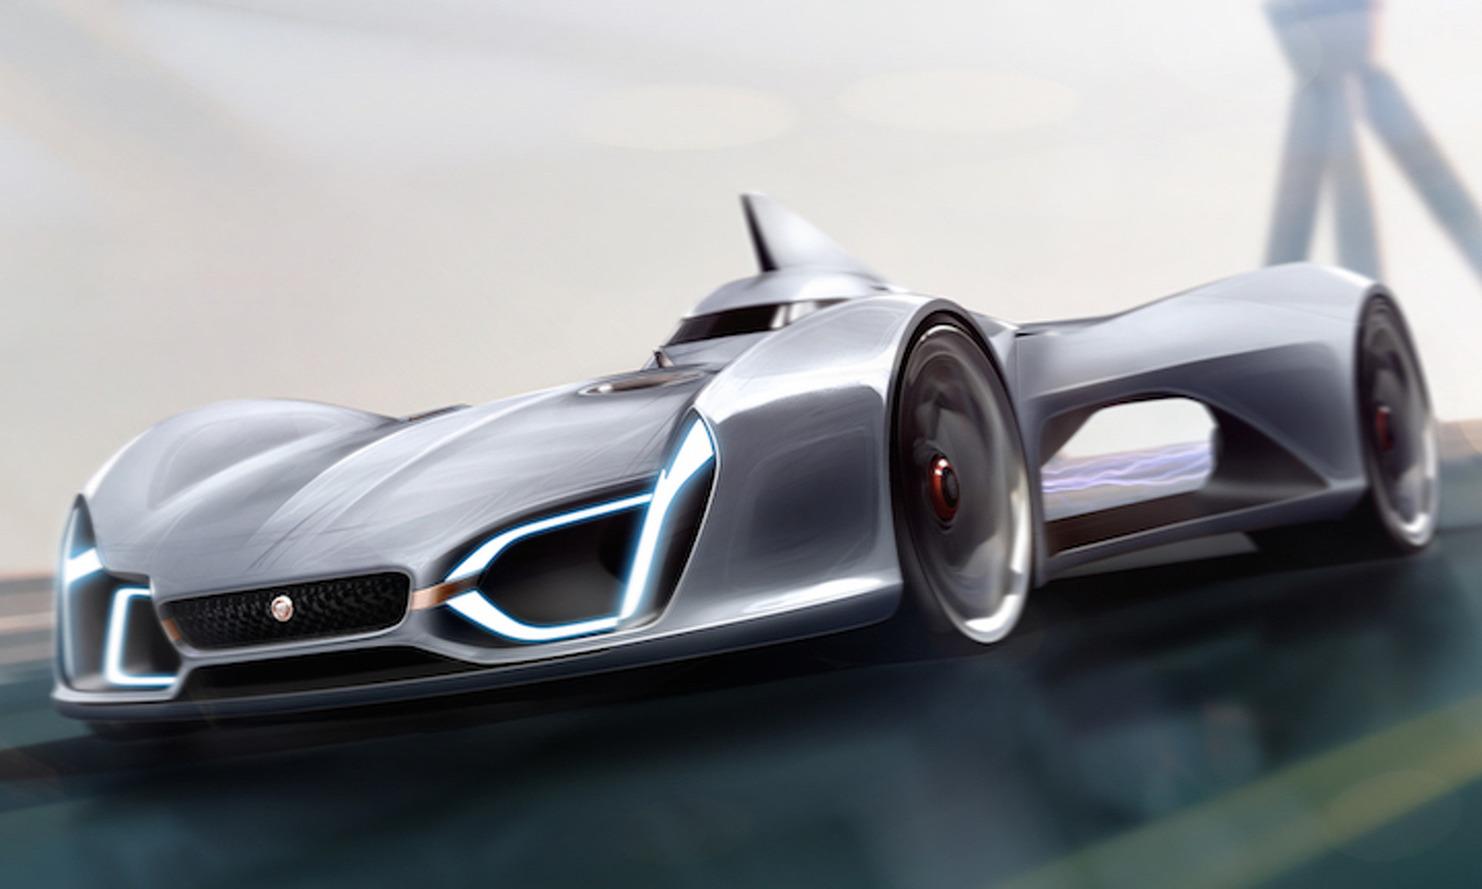 Jaguar Concept Car Pushes the Limits of Technology and Design